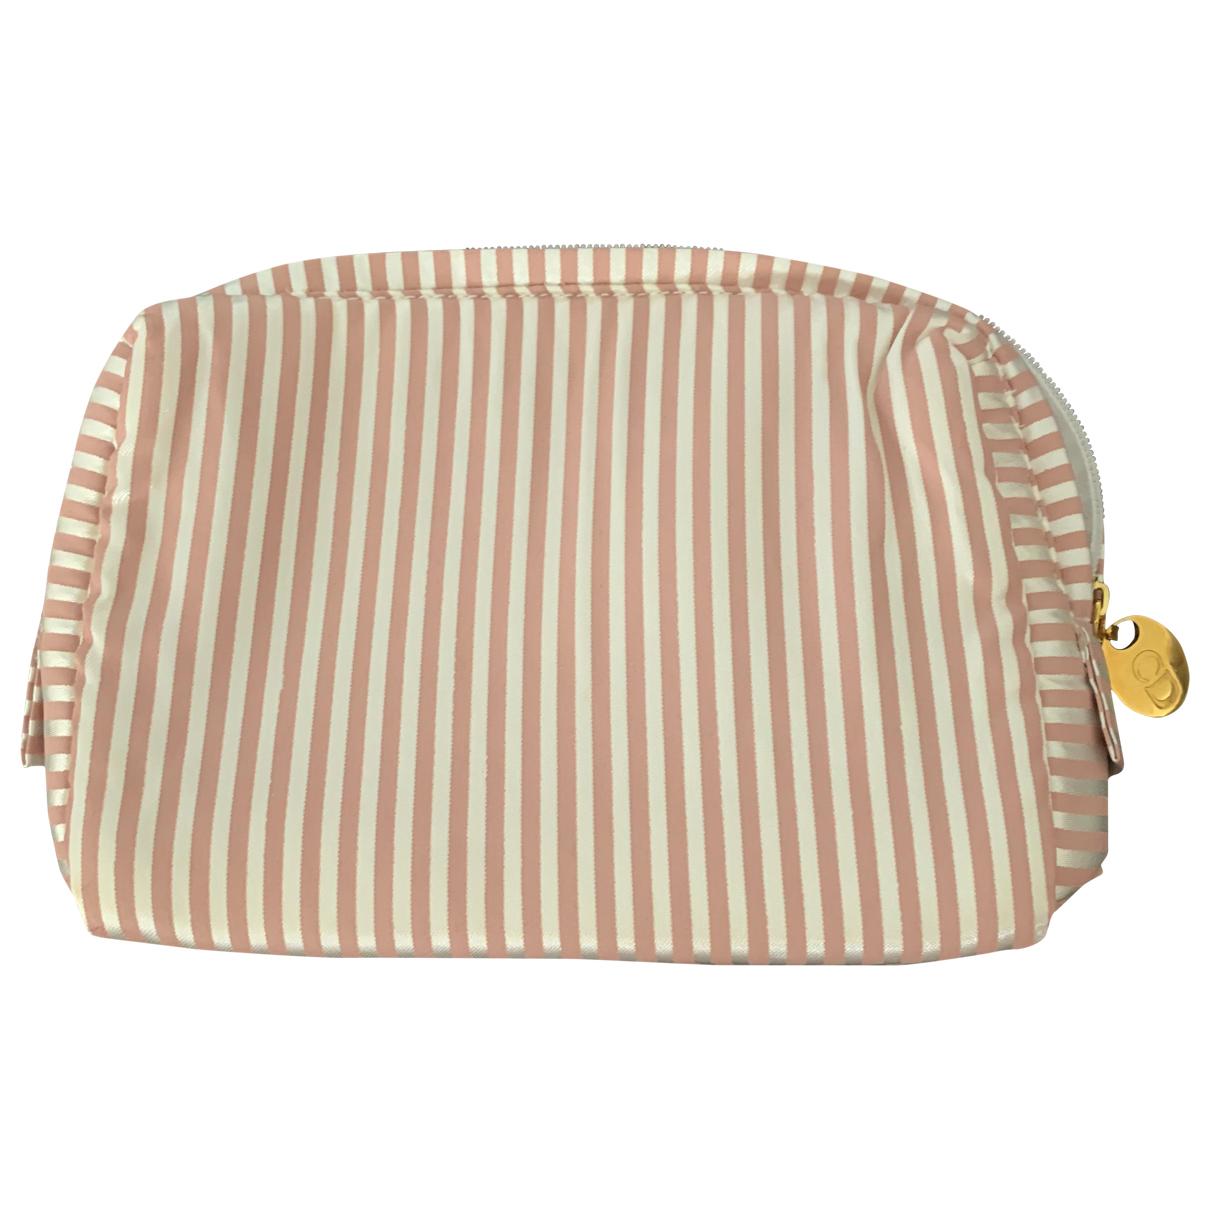 Dior \N Pink Cloth Clutch bag for Women \N